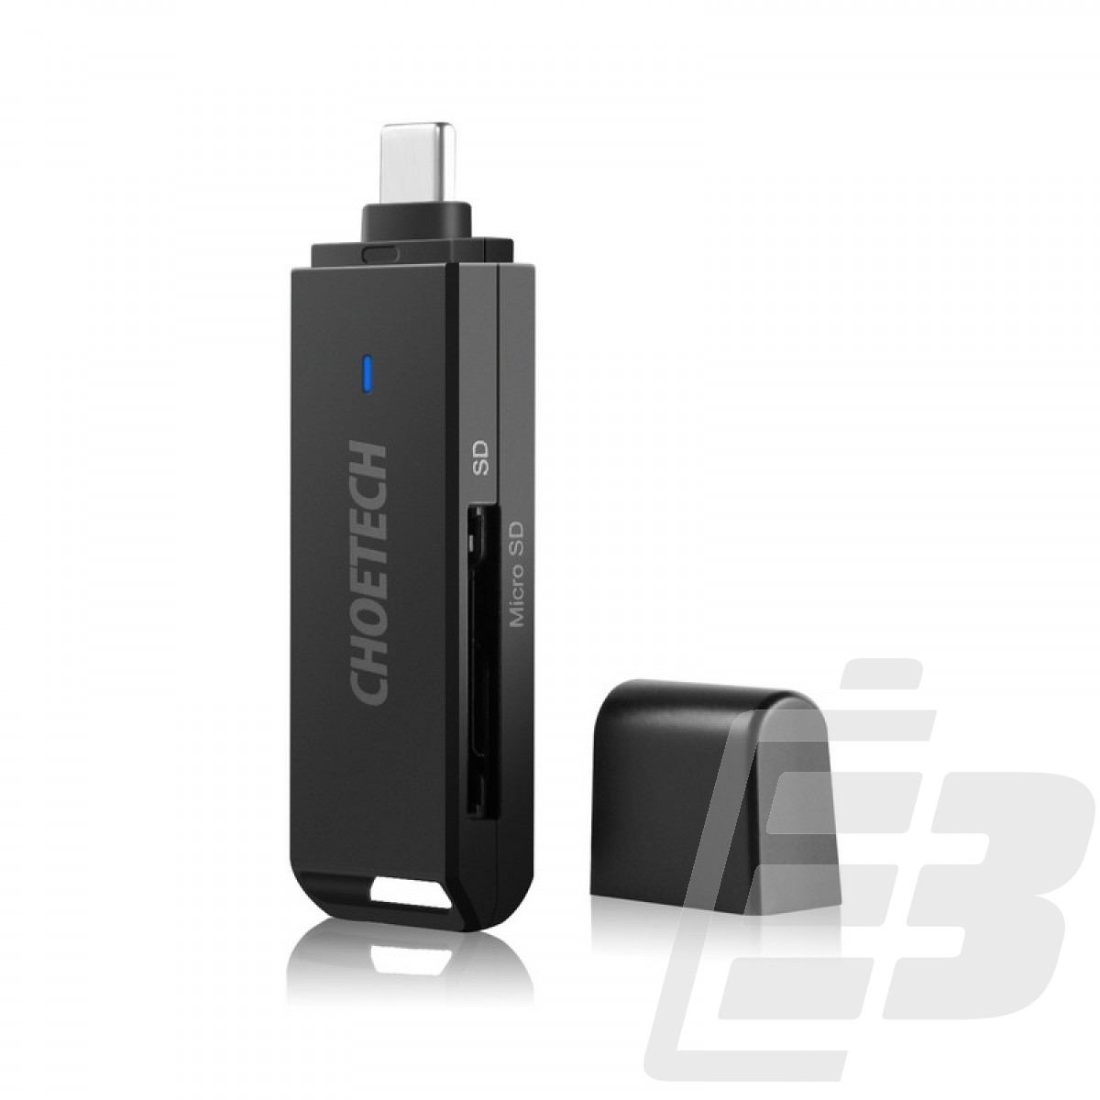 Choetech USB-C Card Reader_1